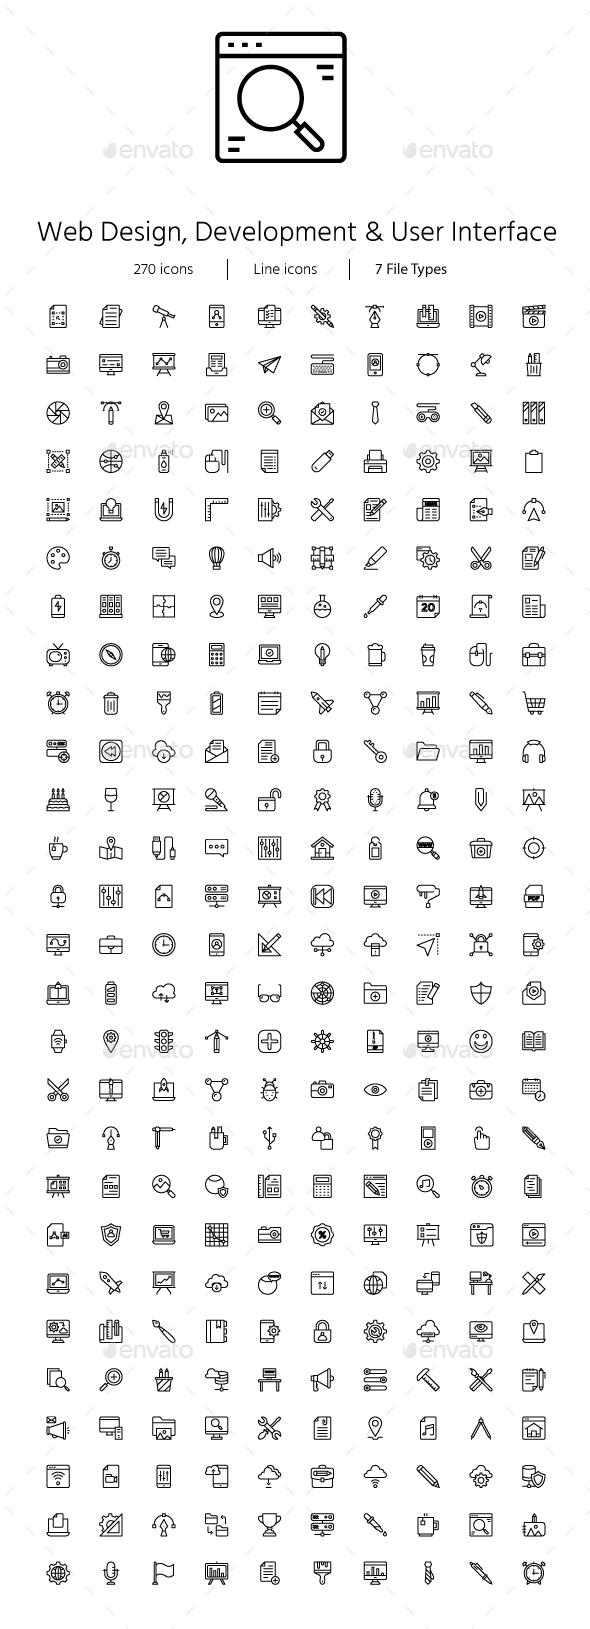 Web Design, Development & User Line icons - Web Icons